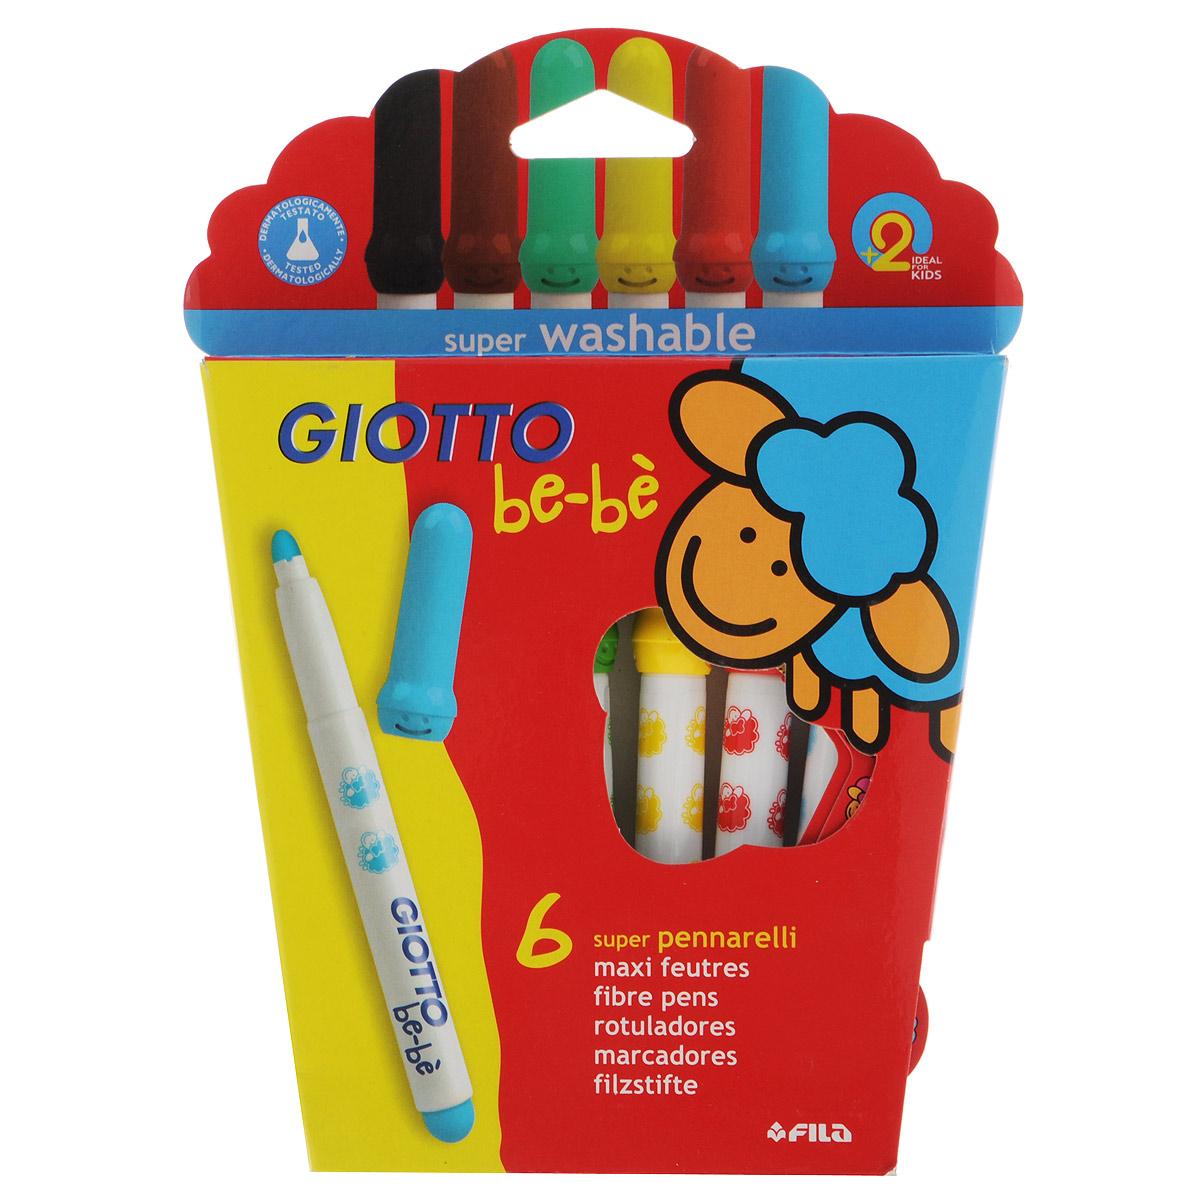 Фломастеры Giotto Bebe Super Fibre Pens, 6 цветов466600